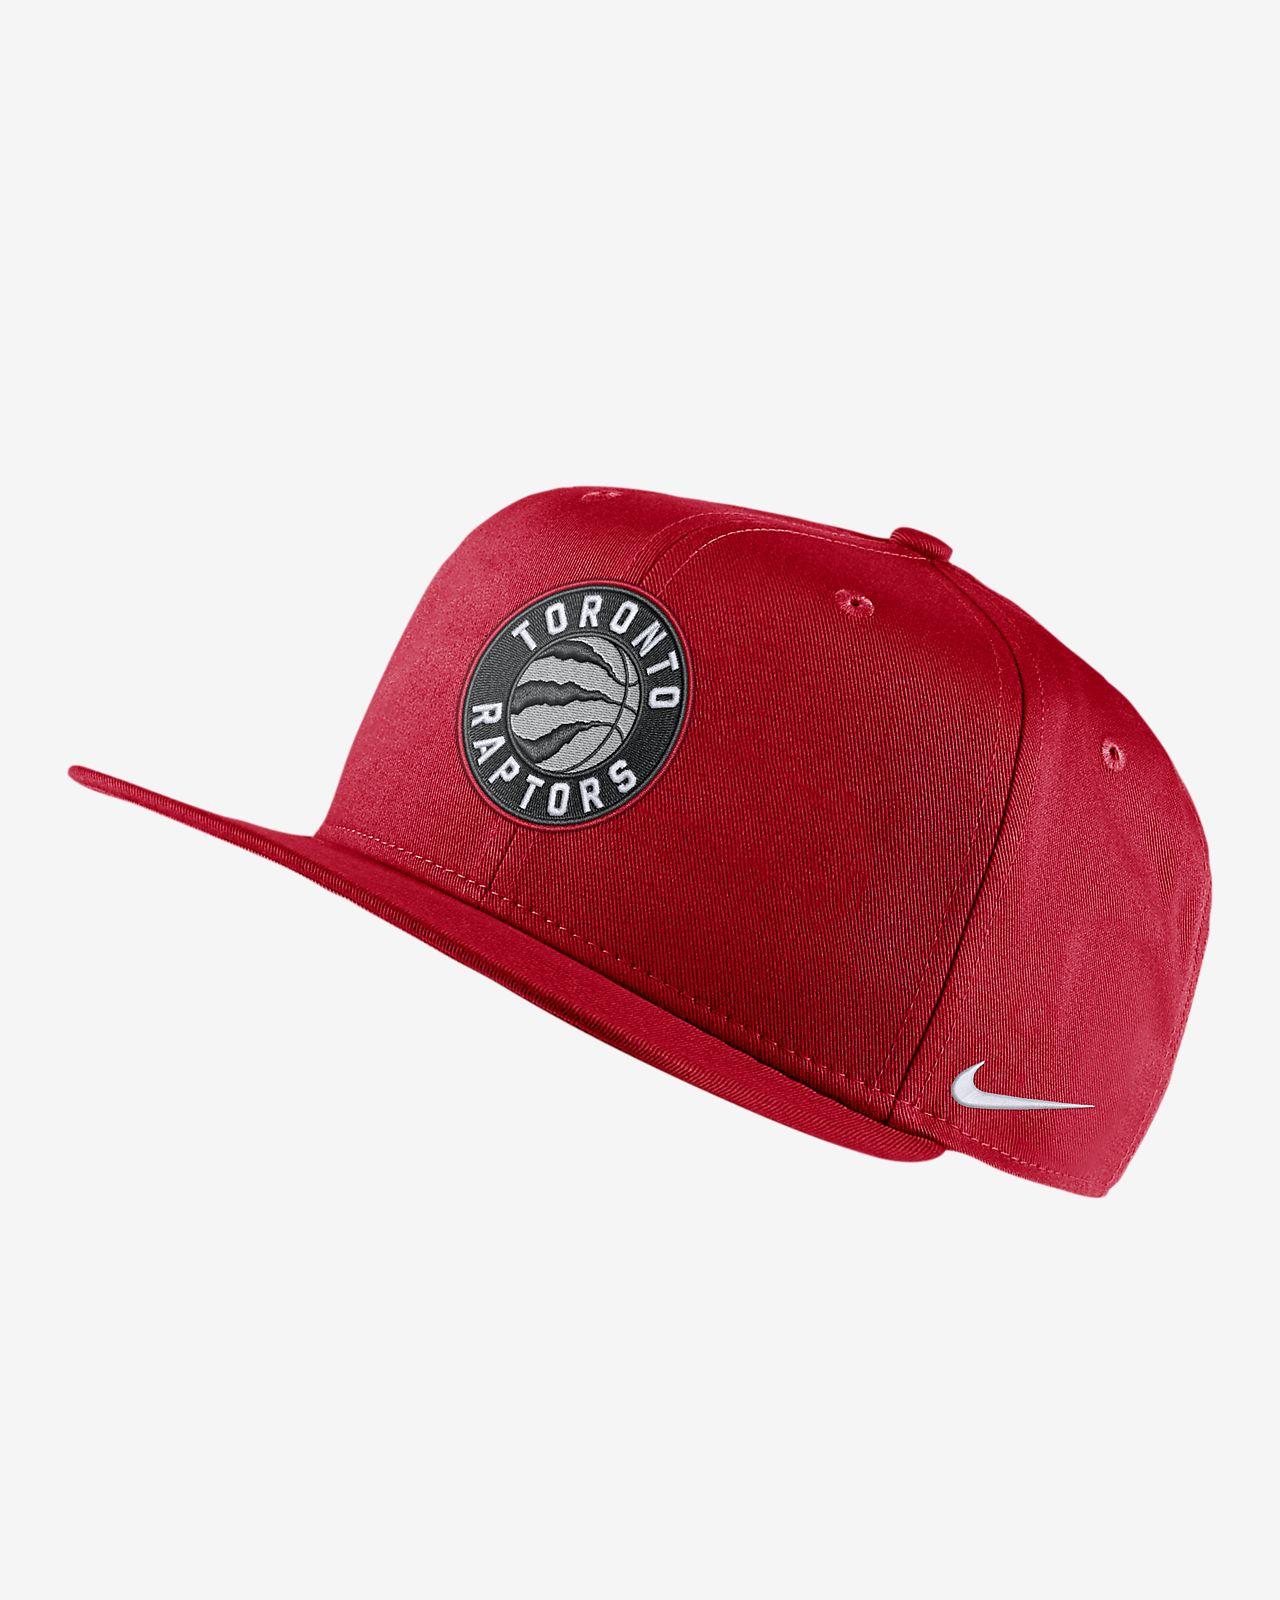 meilleur service 00a43 75f1e Casquette NBA Toronto Raptors Nike Pro